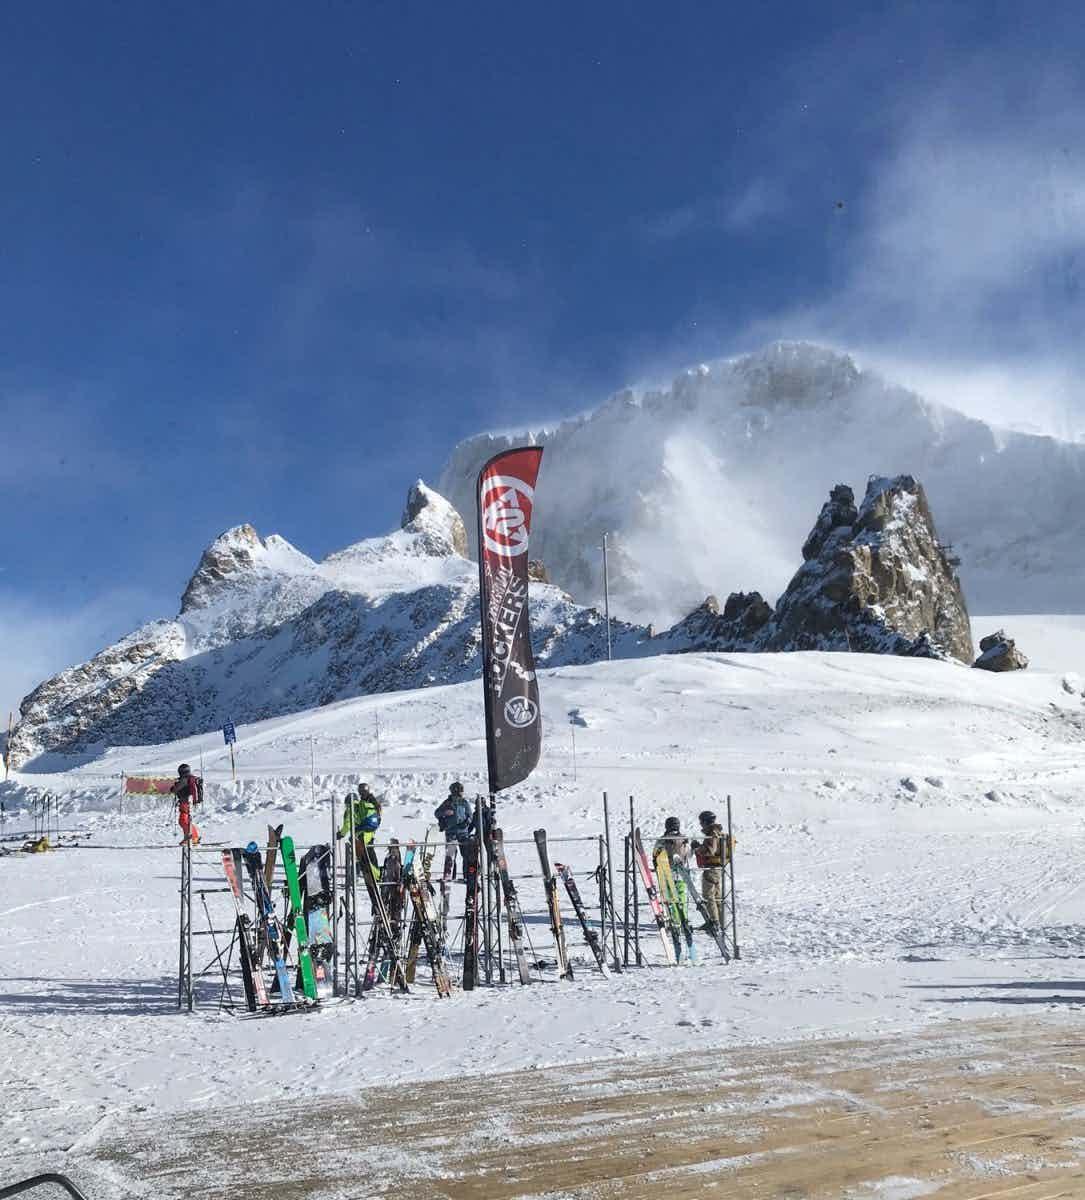 apres ski boeken3.jpeg